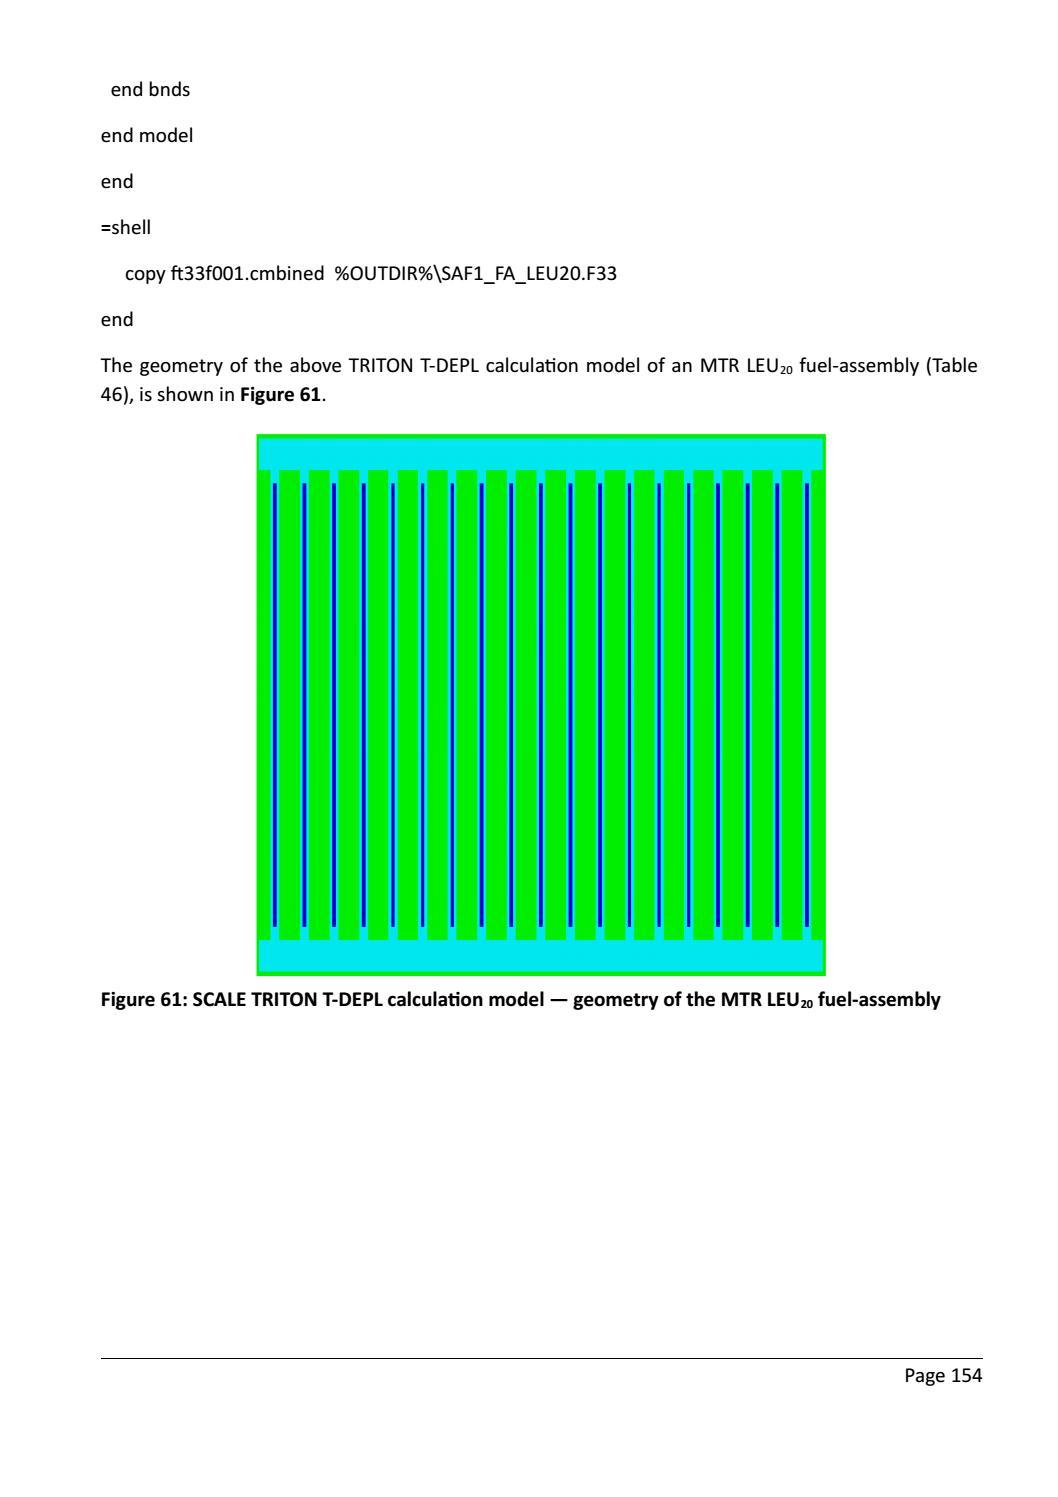 RADIOACTIVE WASTE: COMPUTATIONAL CHARACTERISATION and SHIELDING page 179